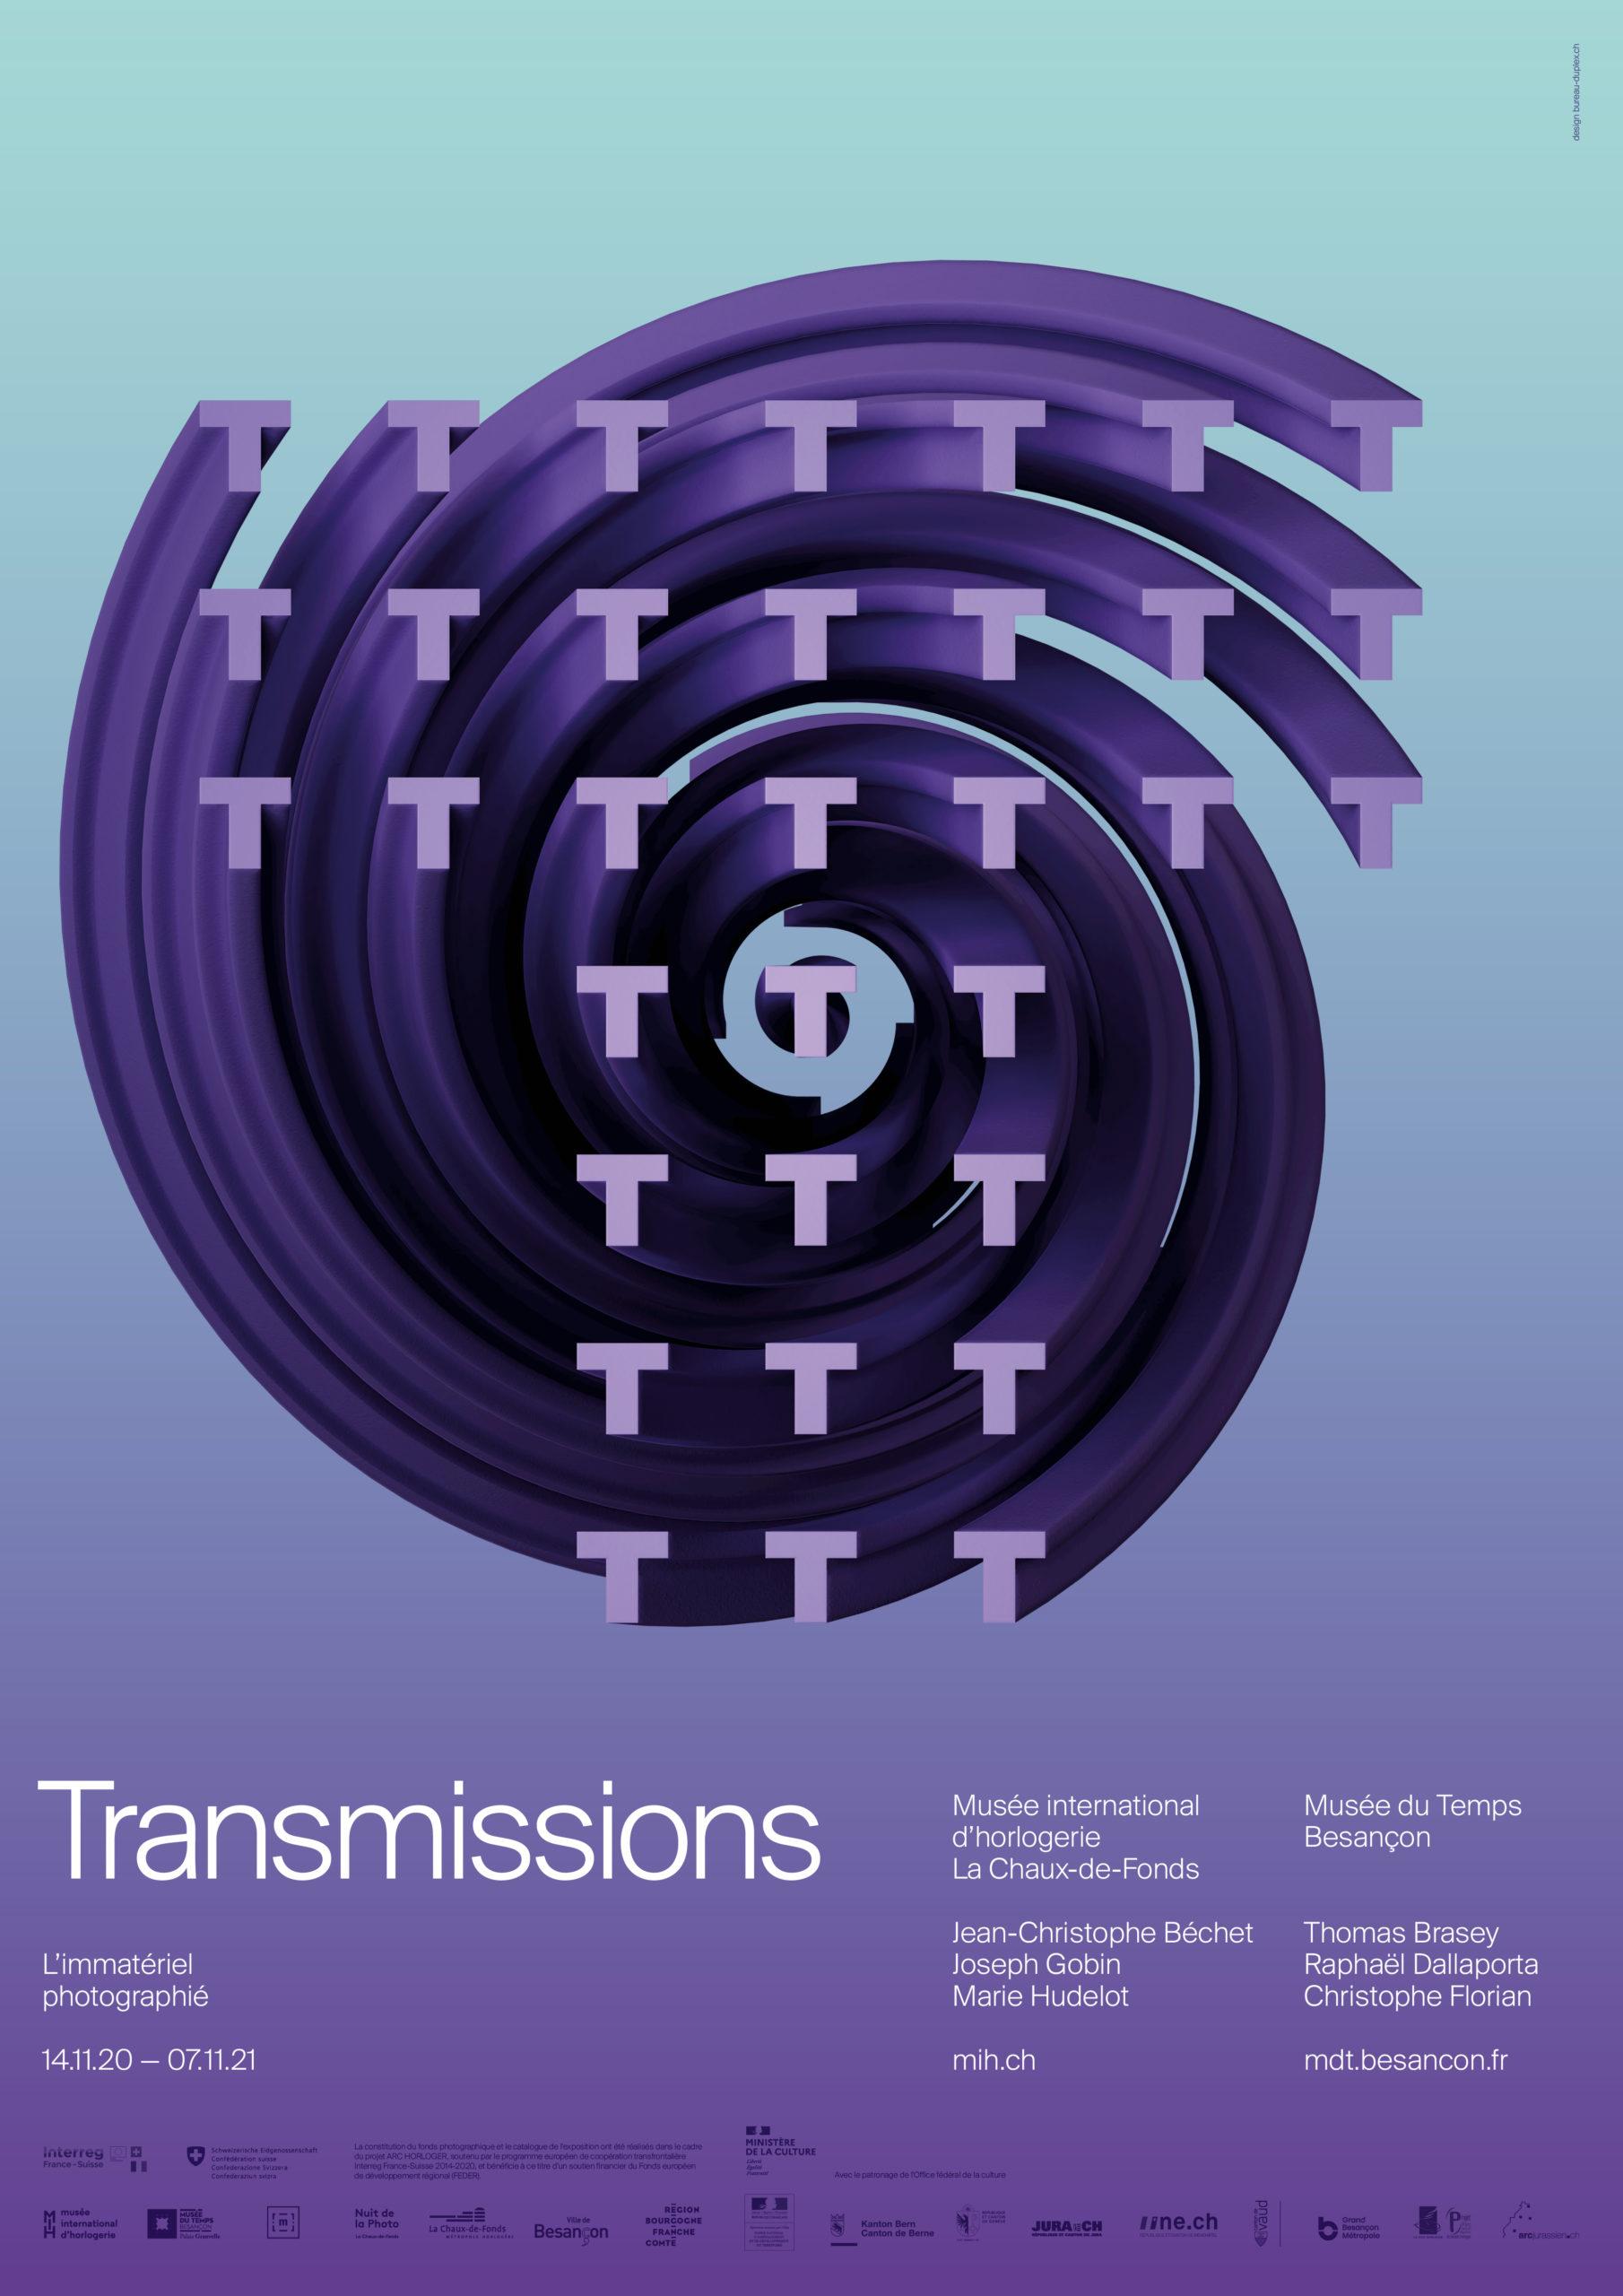 musei%c2%81e-du-temps-3-mih-mdt-transmissions_affiches_22042021-2-2